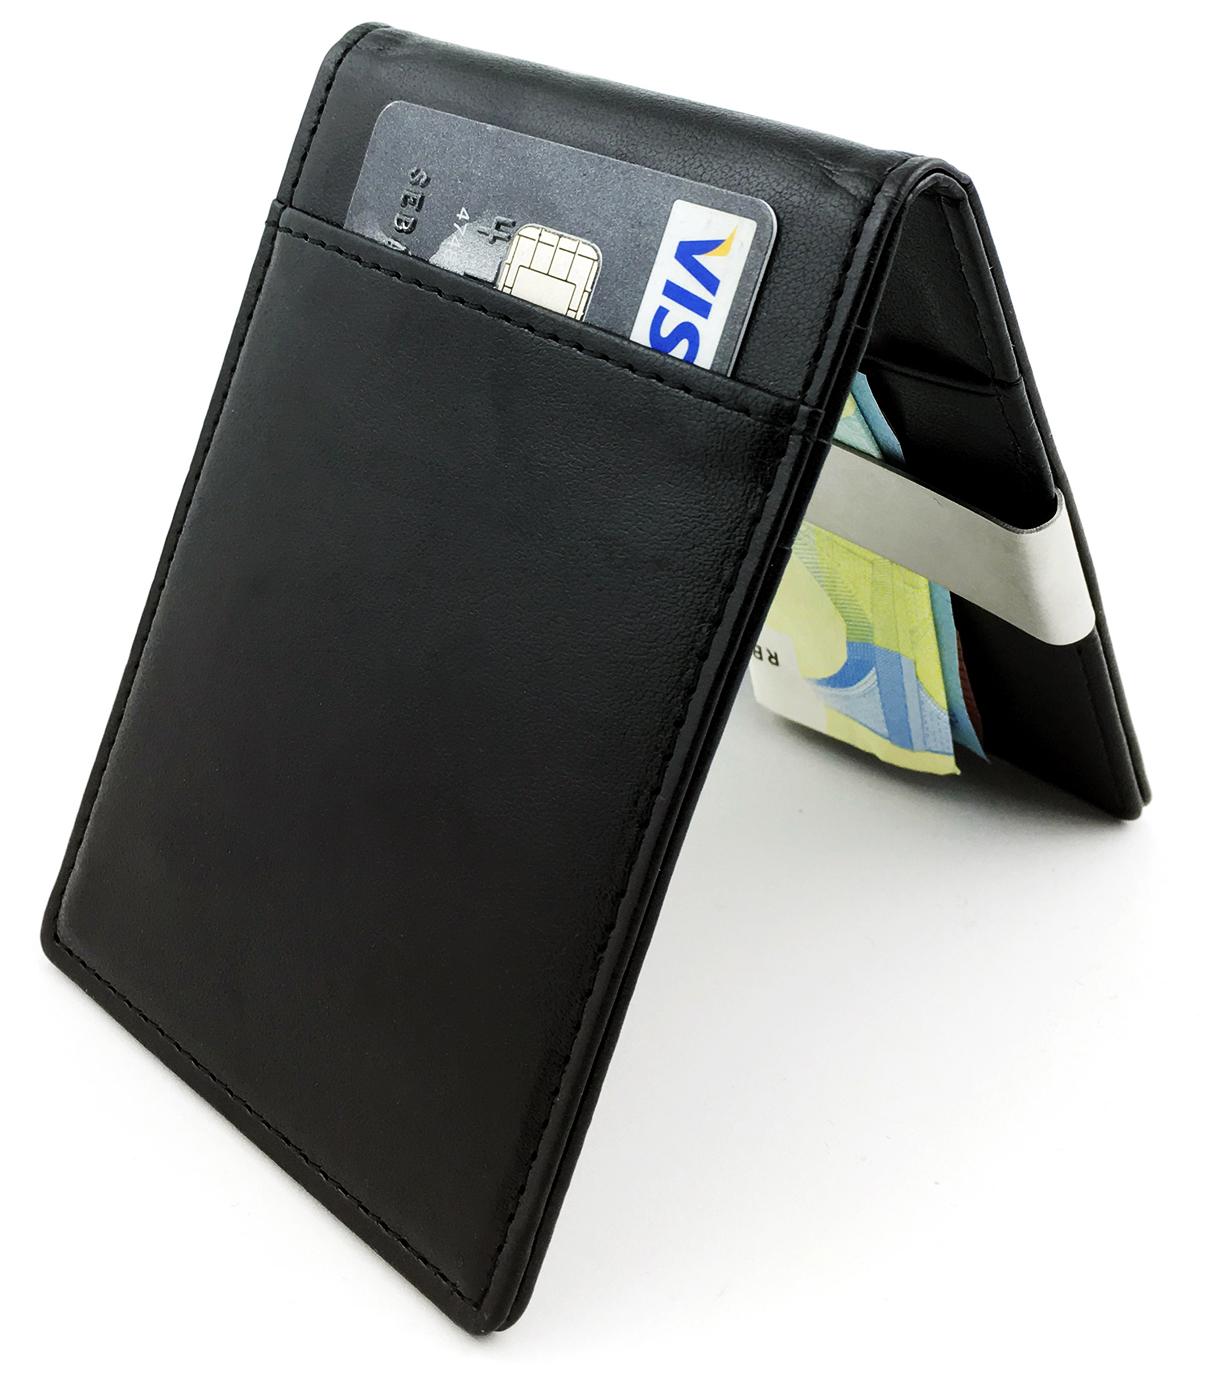 10 X Sets Stainless Steel Money Clip Cash Credit Card Holder Wallet Purse Blue